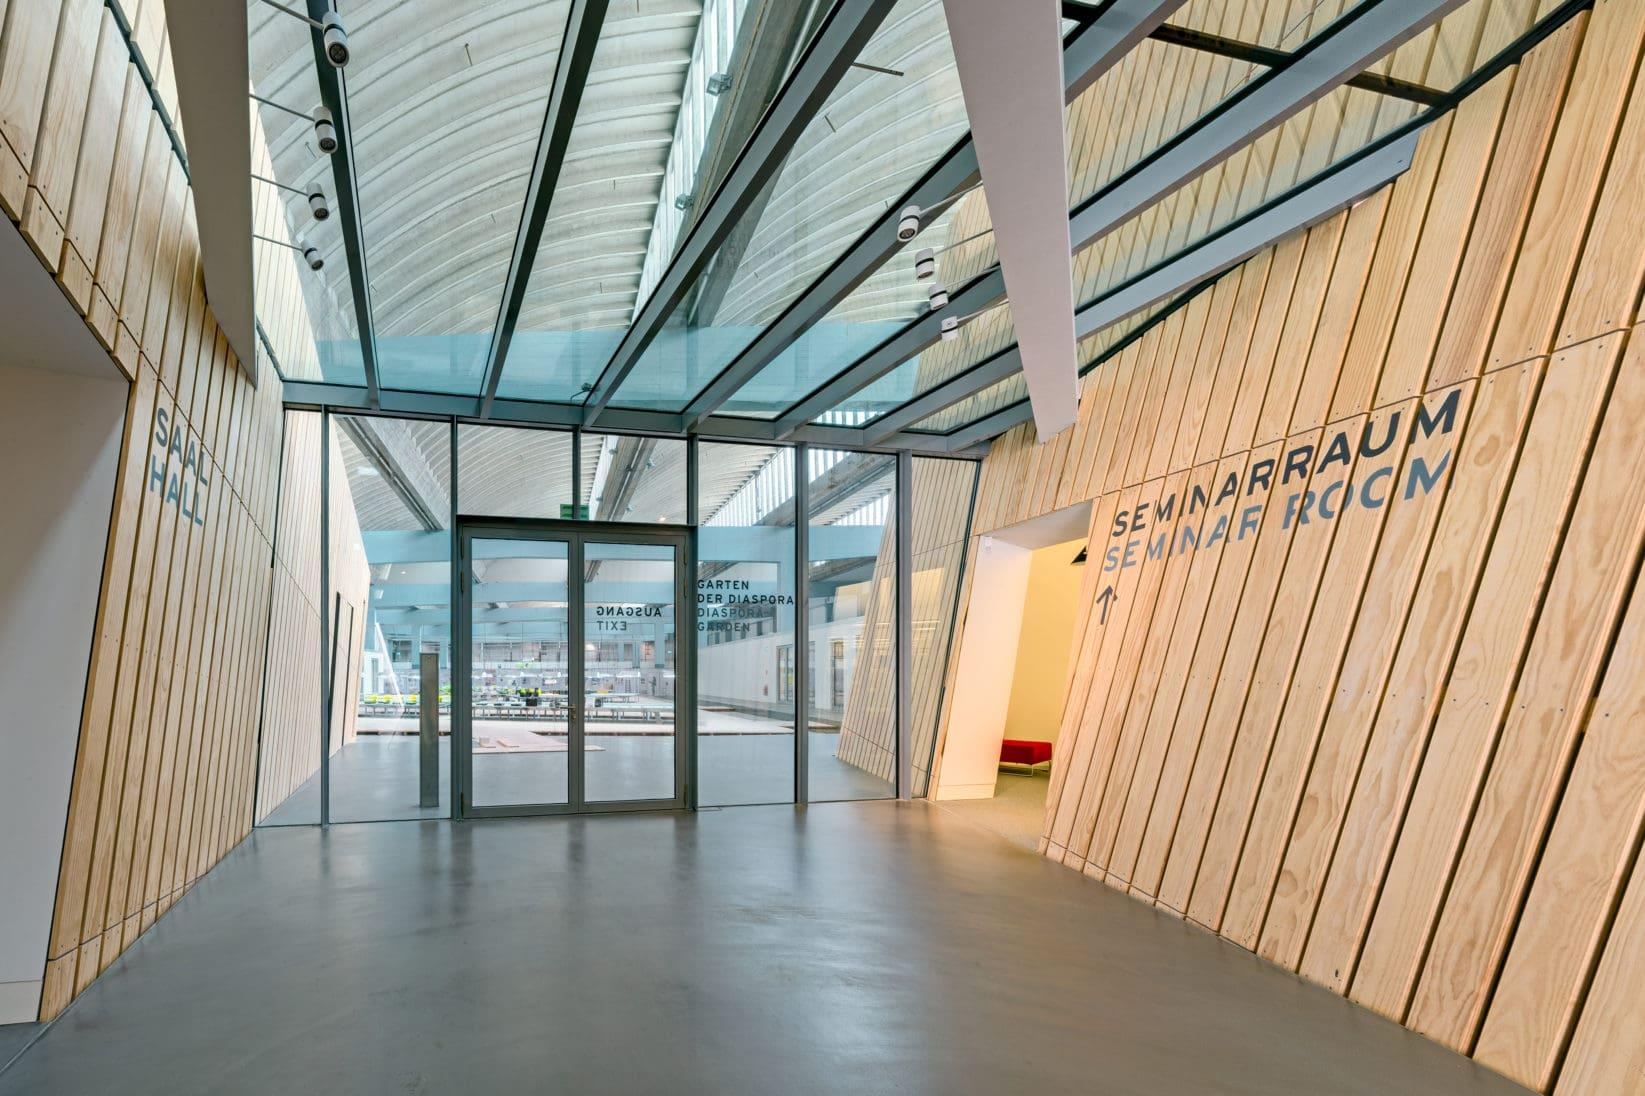 Juedisches Museum Berlin Akademie Seminar